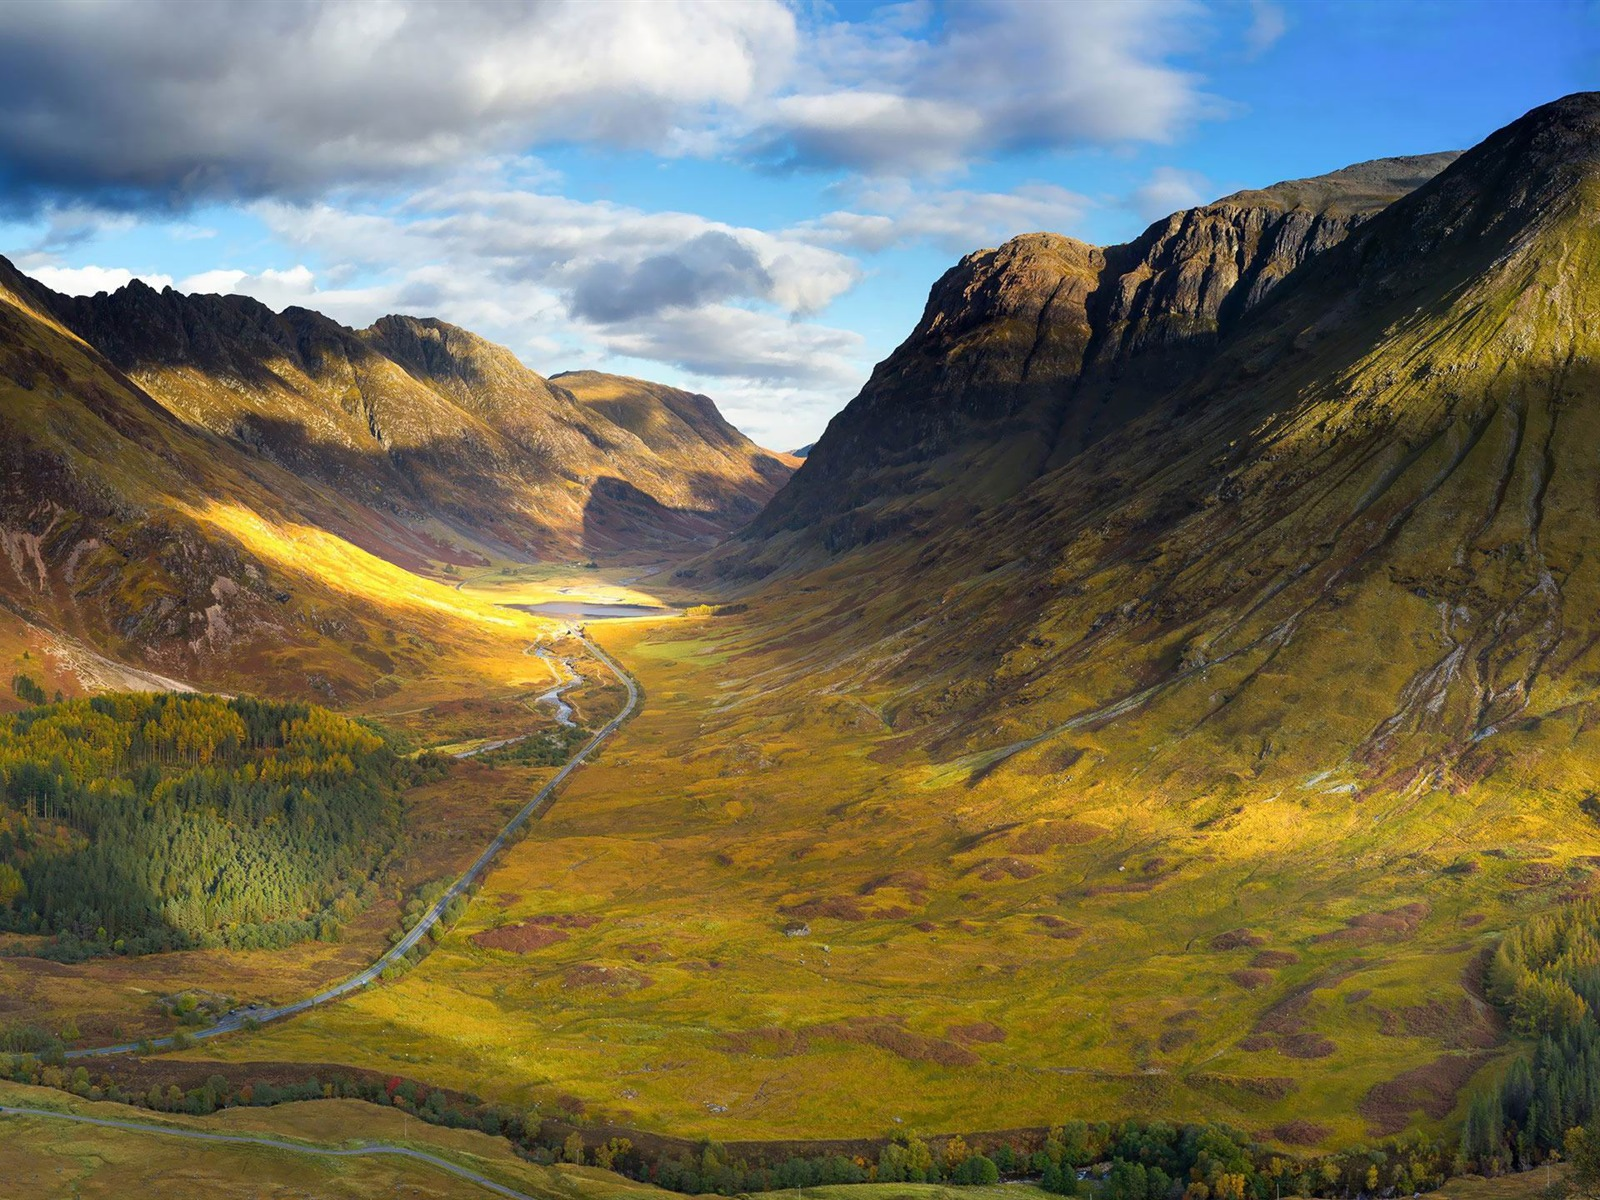 Mountain Valley-landscape HD Widescreen Wallpaper Preview